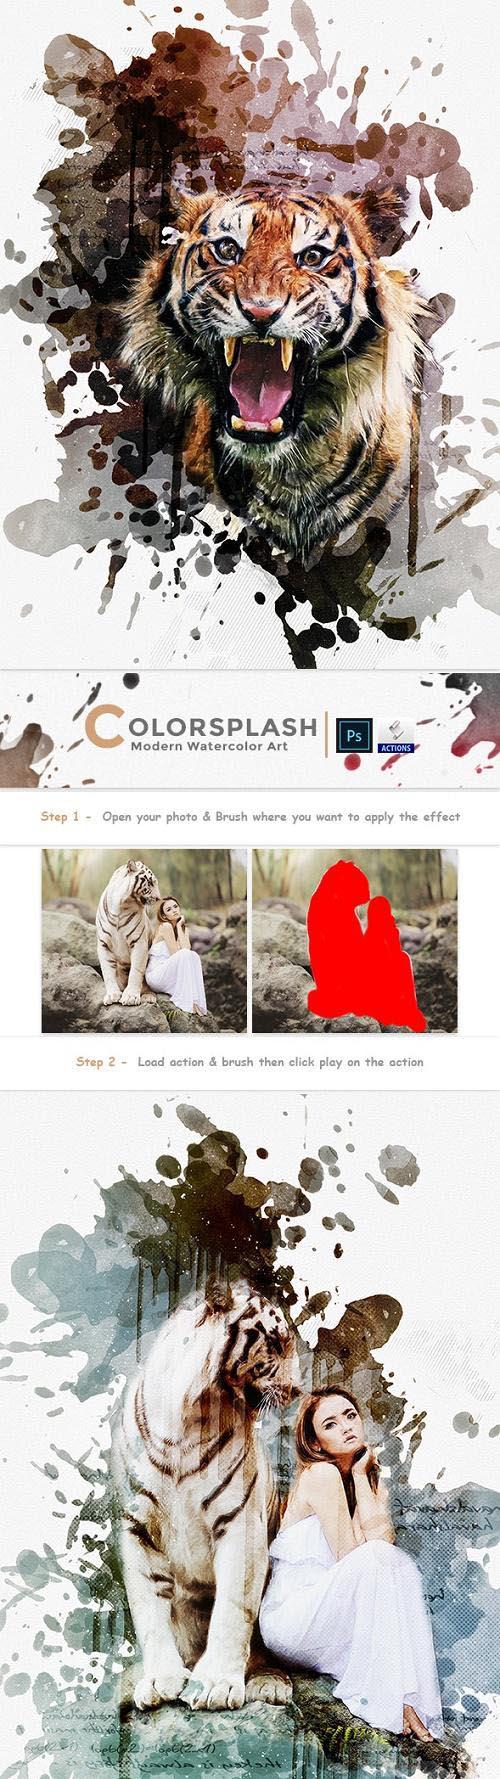 Colorsplash - Modern Watercolor Art 23785768